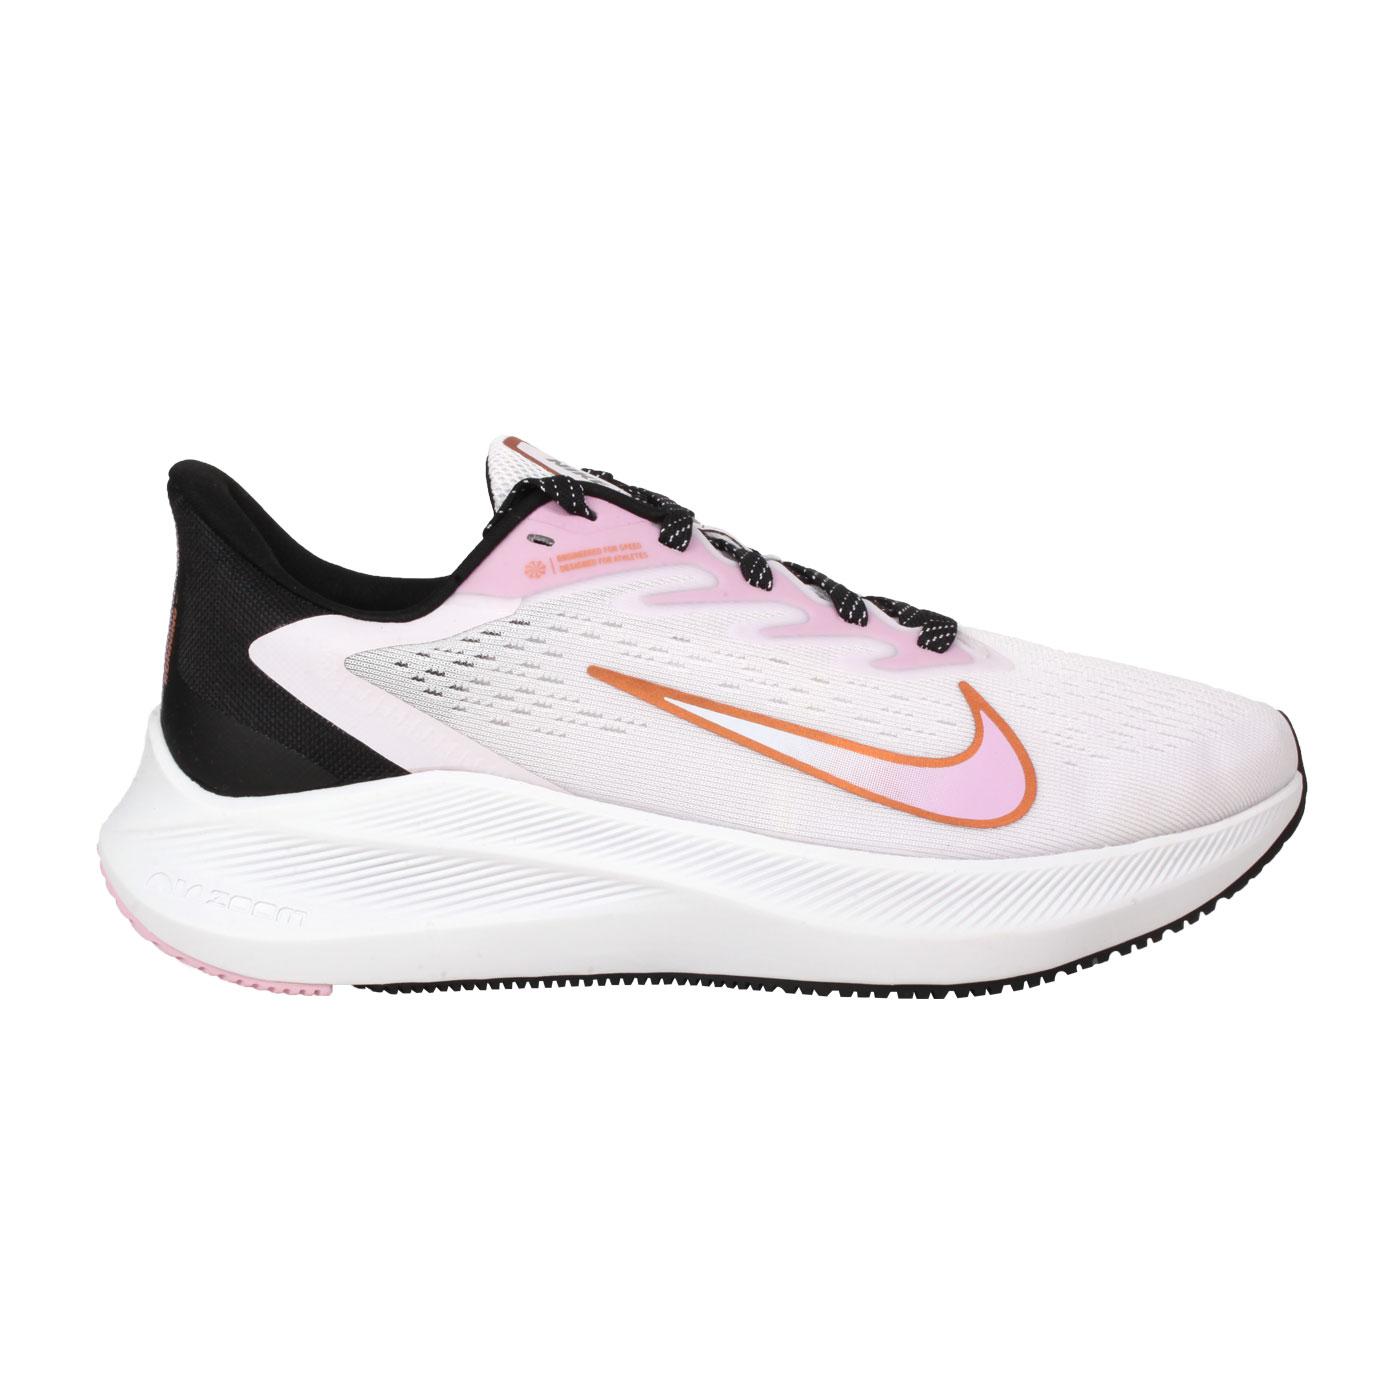 NIKE 女款運動鞋  @WMNS  ZOOM WINFLO 7@CJ0302501